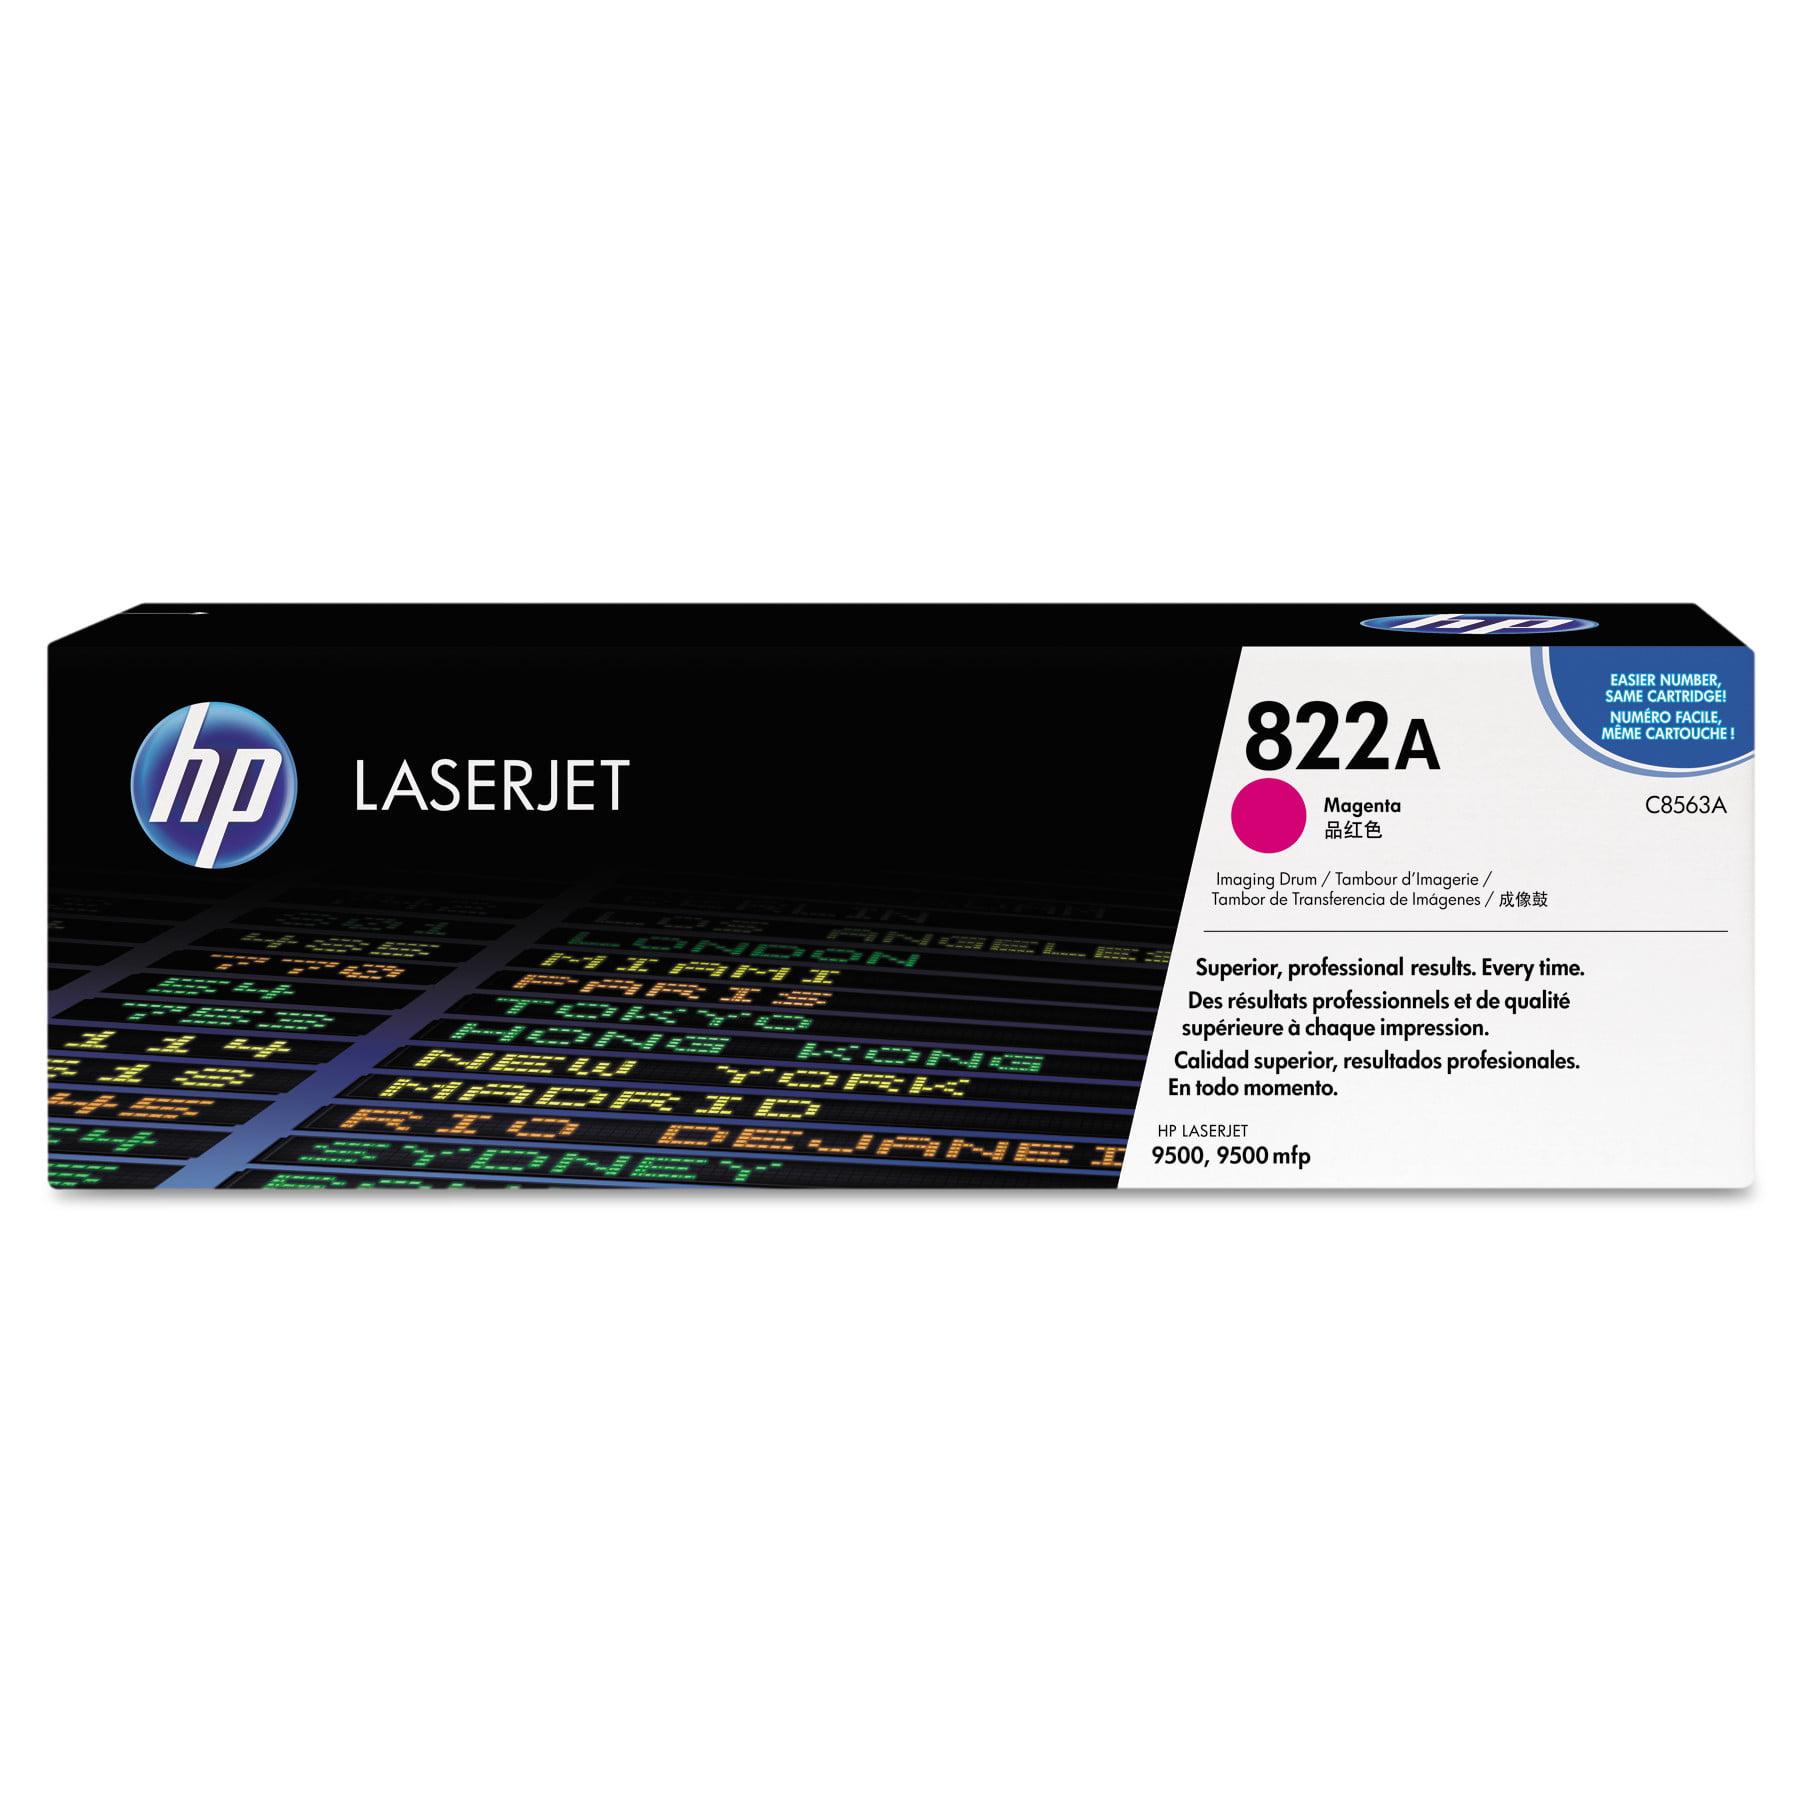 HP 822A (C8563A) Magenta Original LaserJet Image Drum